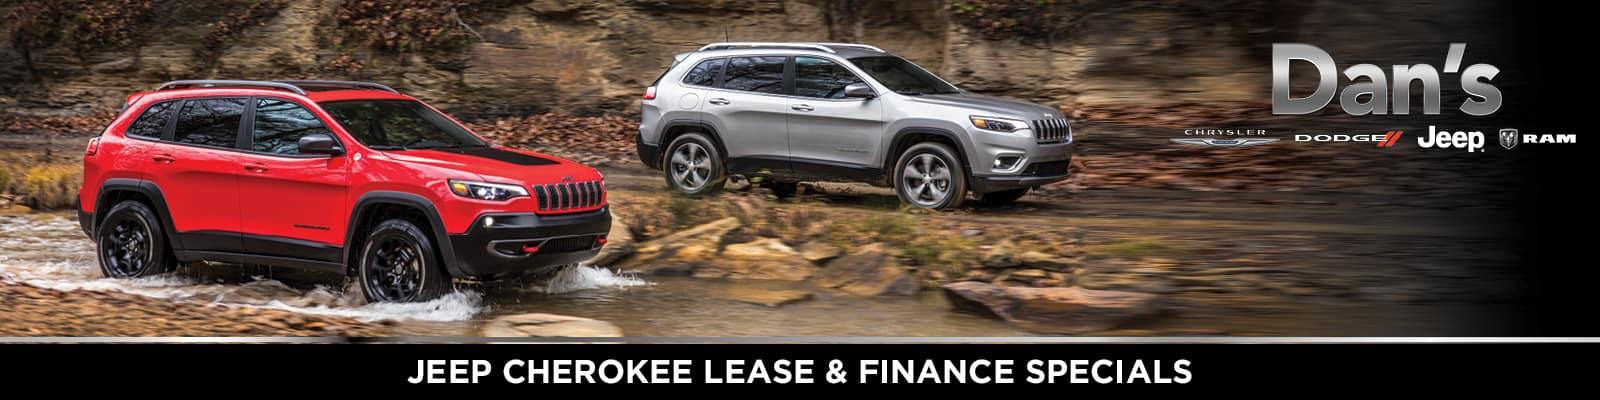 Jeep Cherokee Lease & Finance Offers